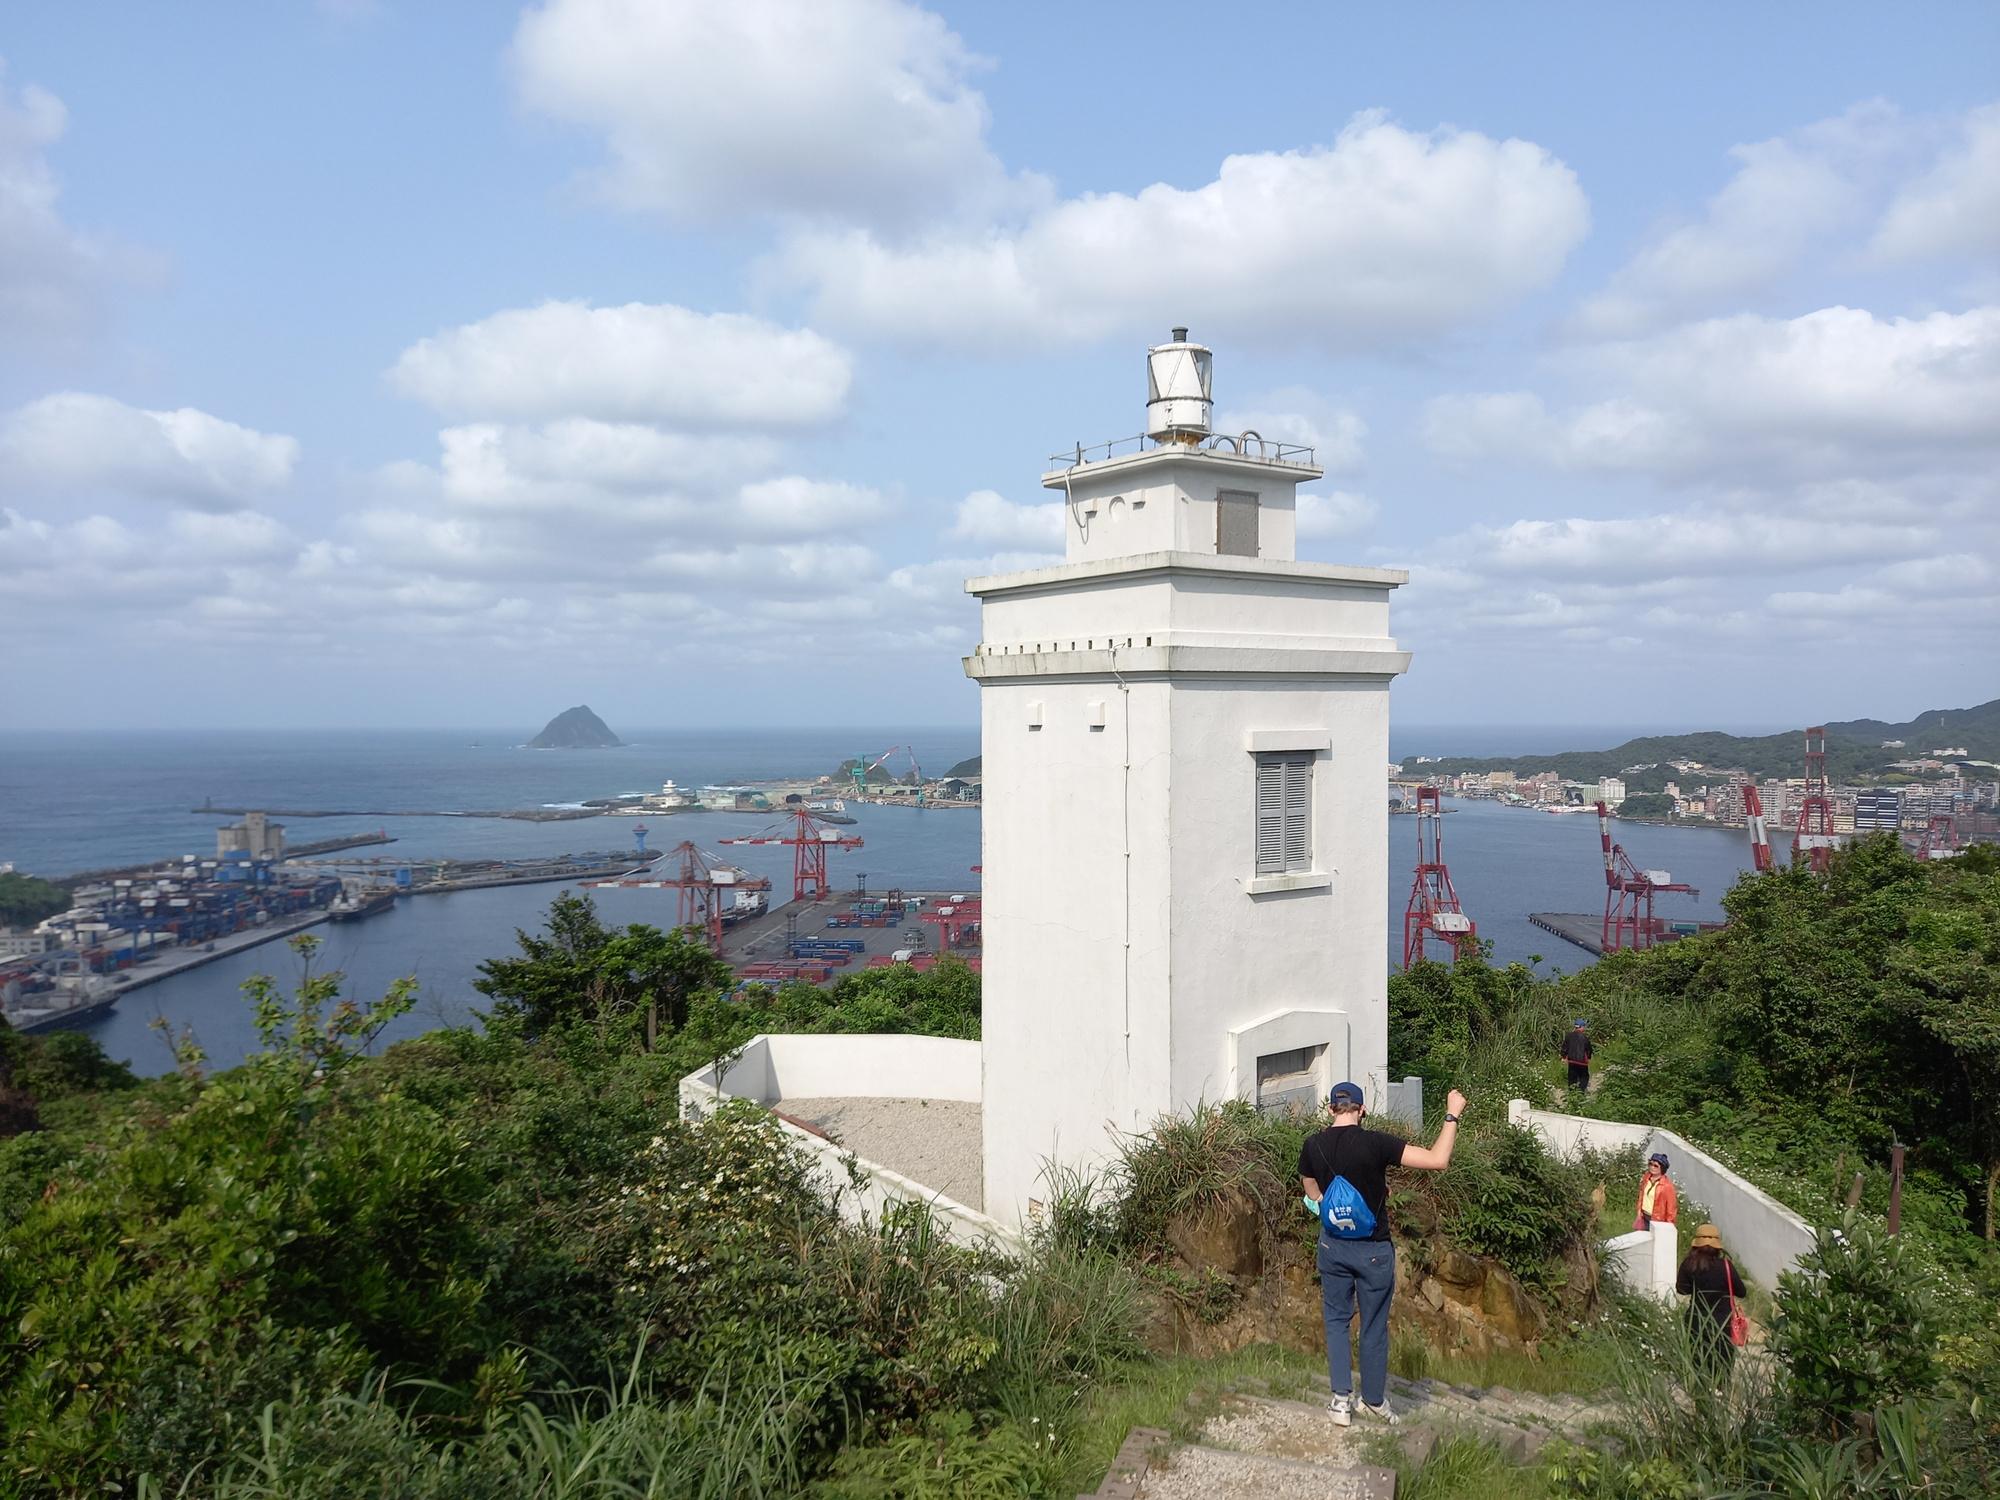 Keelung Day Trip Qiuzishan Lighthouse (球子山燈塔)